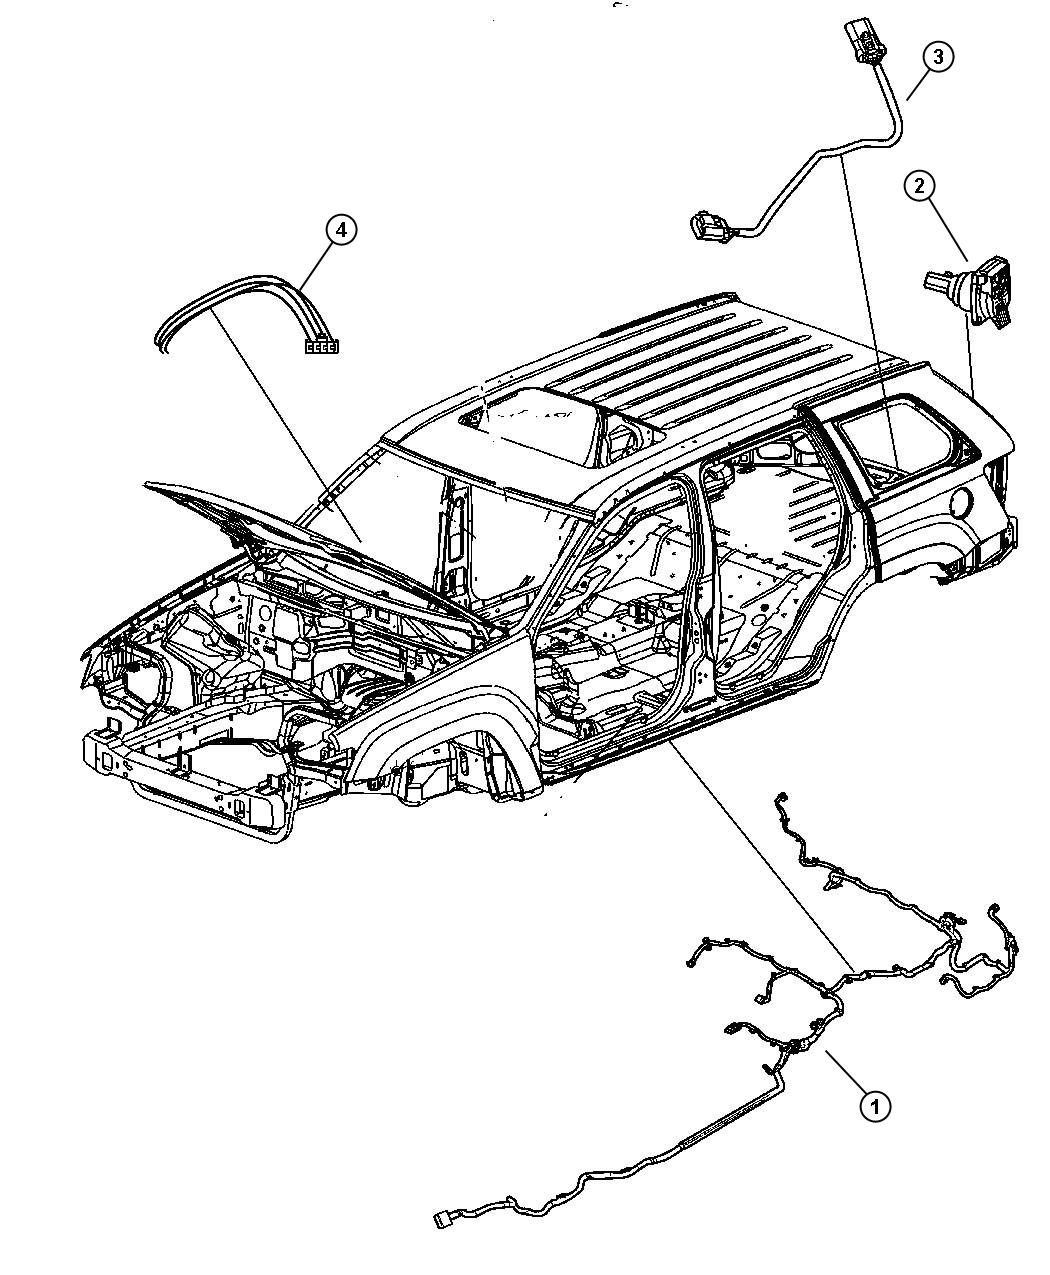 Jeep Grand Cherokee Wiring Underbody Parksense Rear